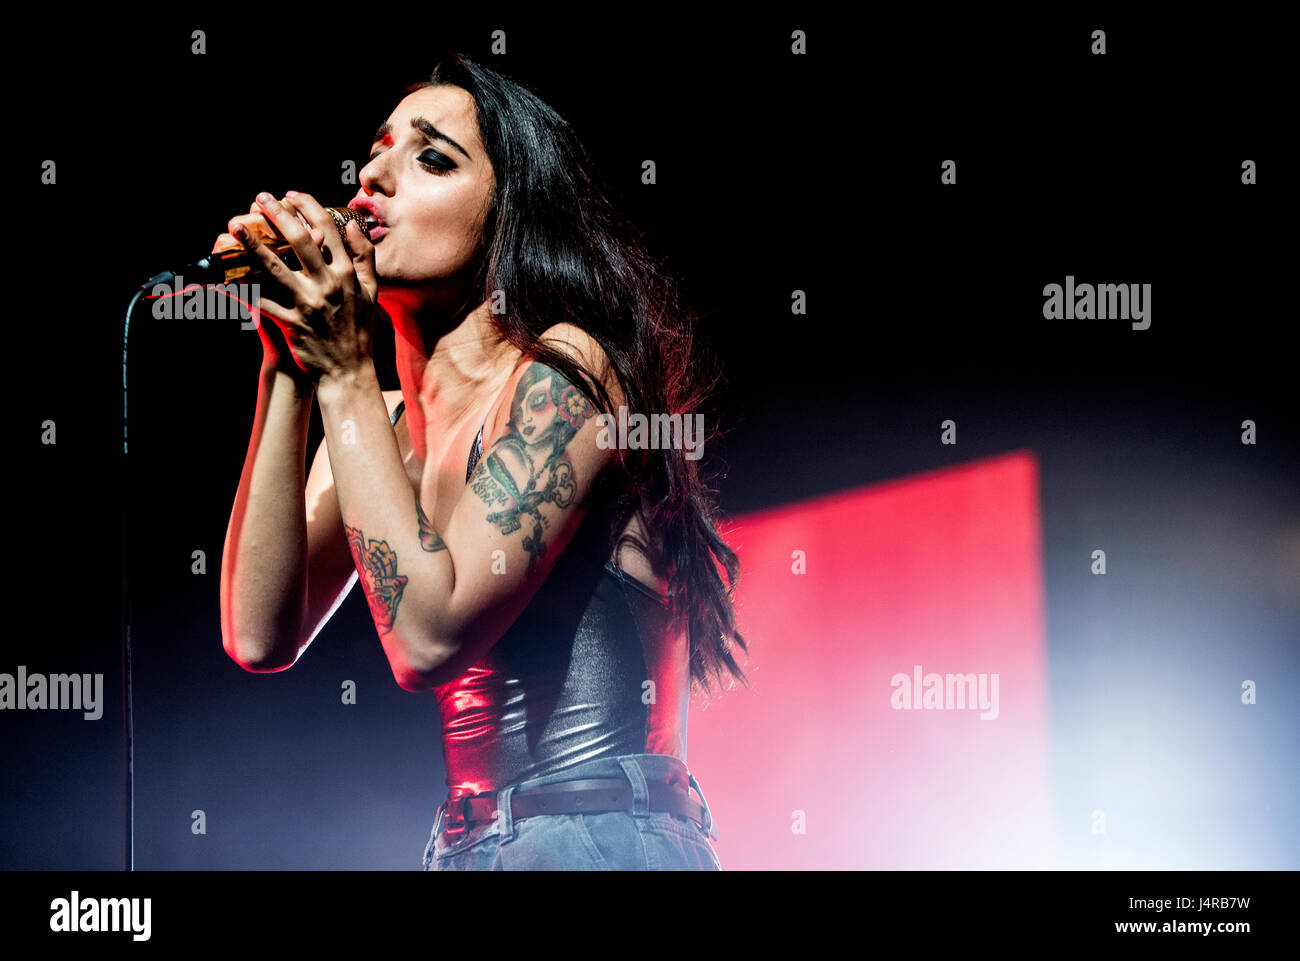 Venaria Reale, Italy. 13th May, 2017.  The italian singer Levante (Claudia Lagona) performs at Teatro della Concordia Stock Photo